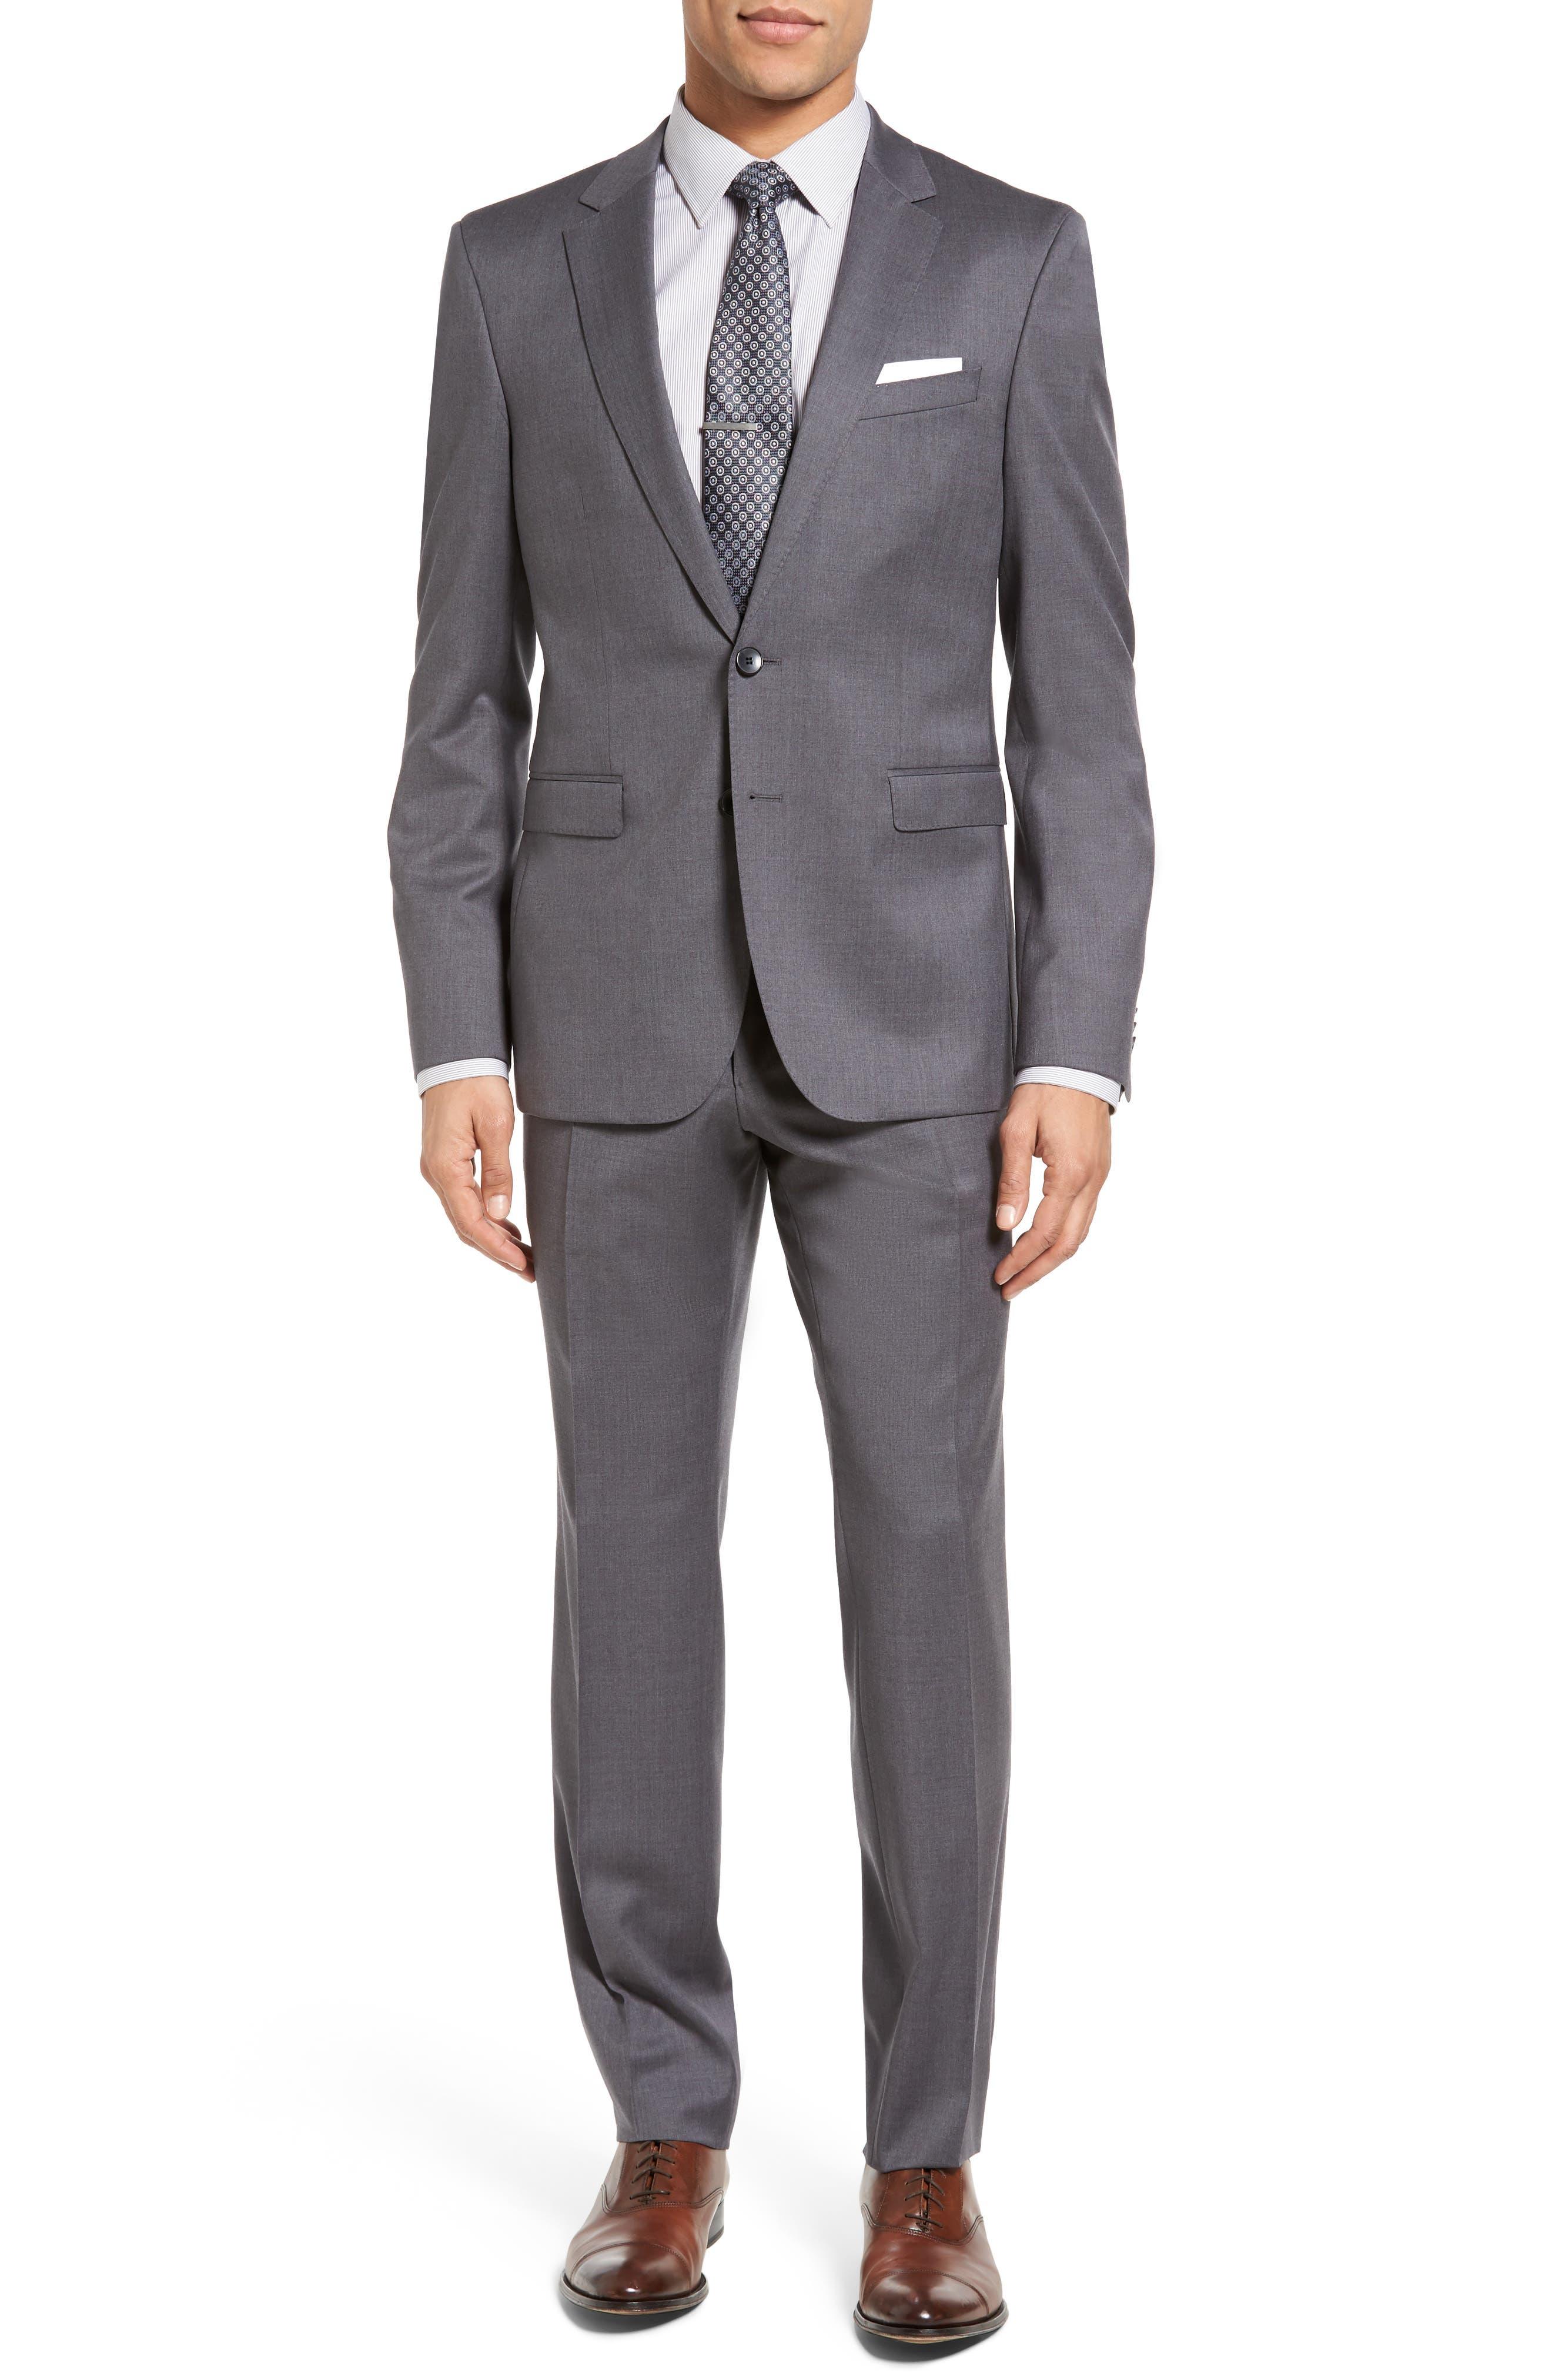 Main Image - BOSS Ryan/Win Trim Fit Solid Wool Suit